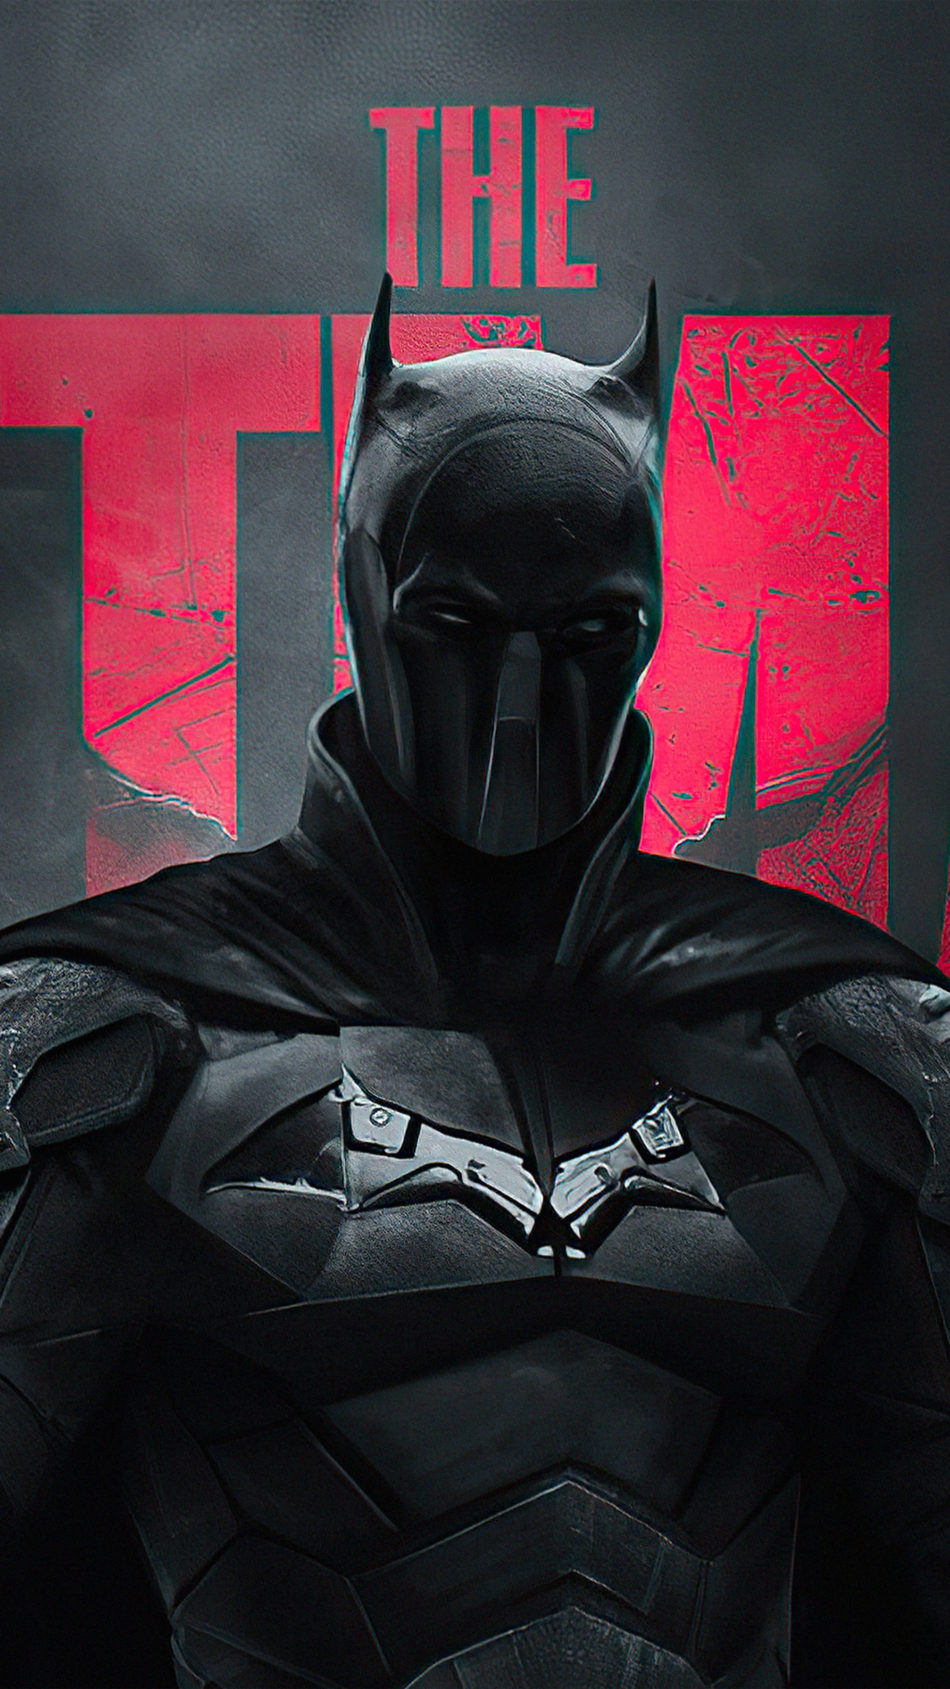 The Batman DC Darkness 2021 Poster 4K Ultra HD Mobile Wallpaper